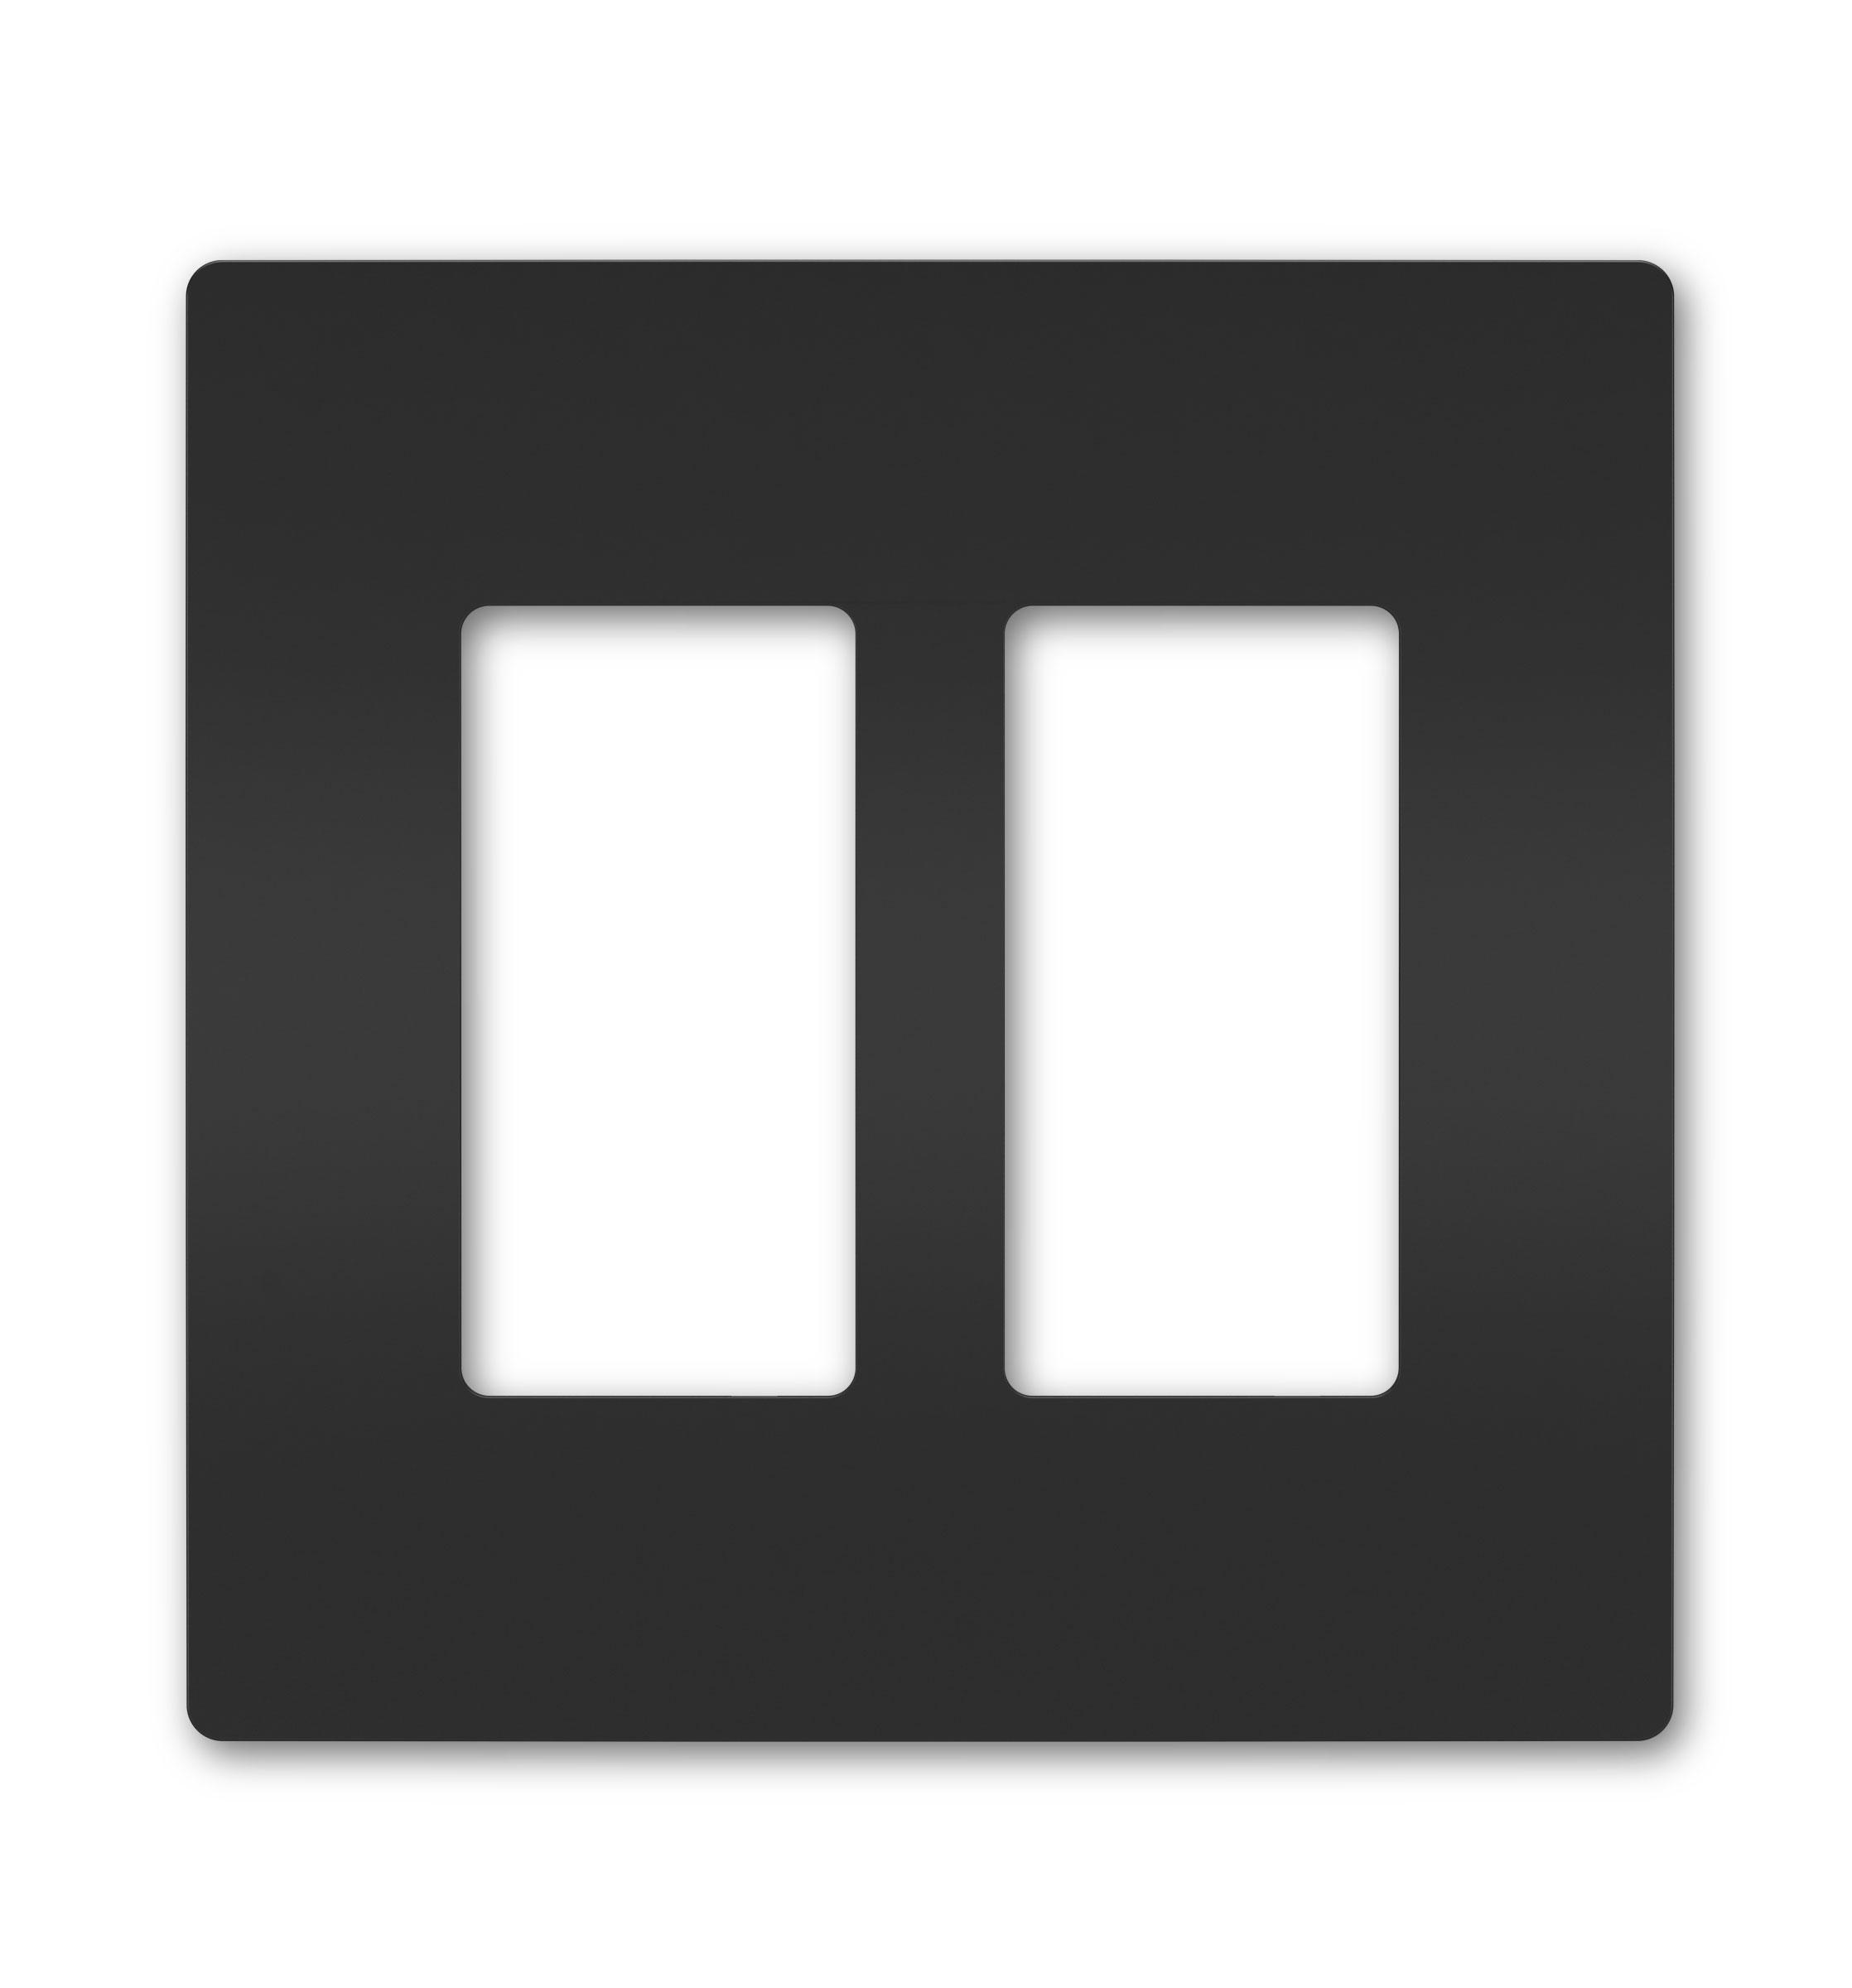 https://www.ideadigitalcontent.com/files/11258/ID-PIC-v1-F541CBC1D3814BFCA46A3426DFBC4375.jpg